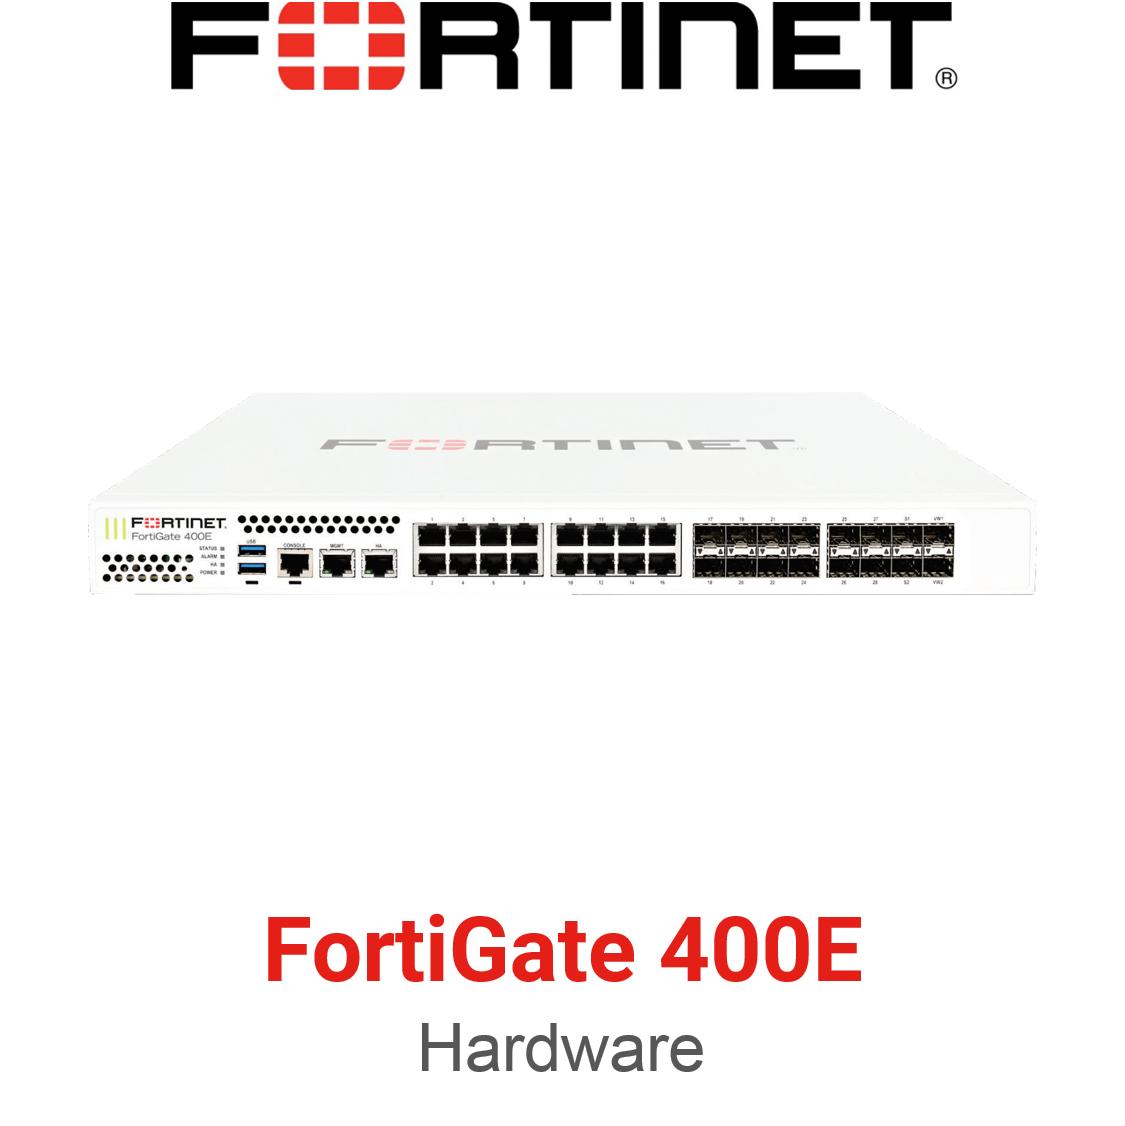 Fortinet FortiGate 400E Firewall